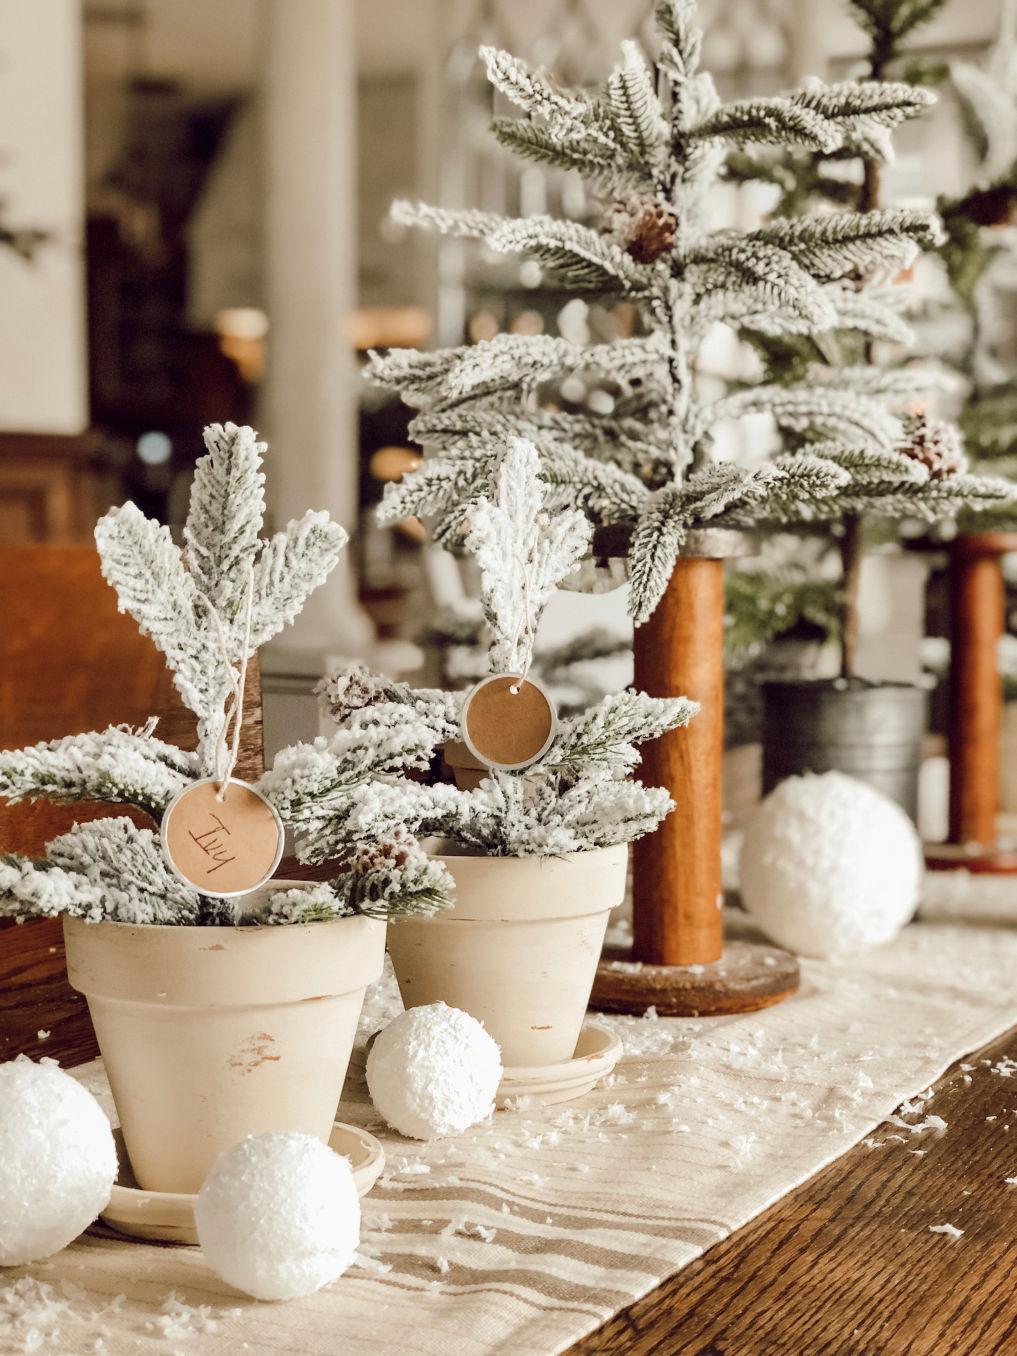 Christmas tree centerpiece #christmas #christmasdecor #christmascrafts #christmastrees #farmhousechristmas